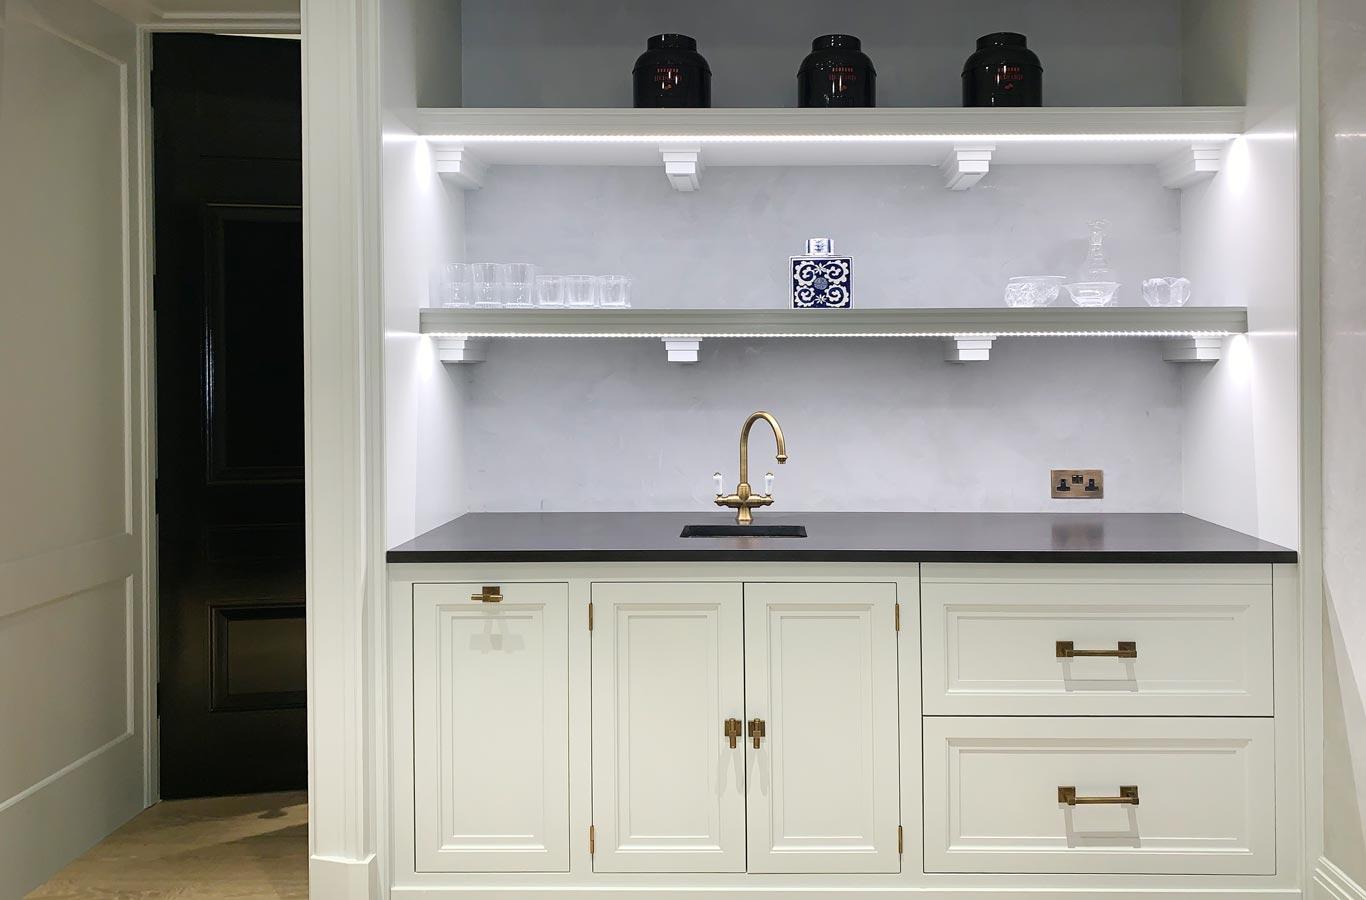 Honed Nero Assoluto Kitchen Worktop